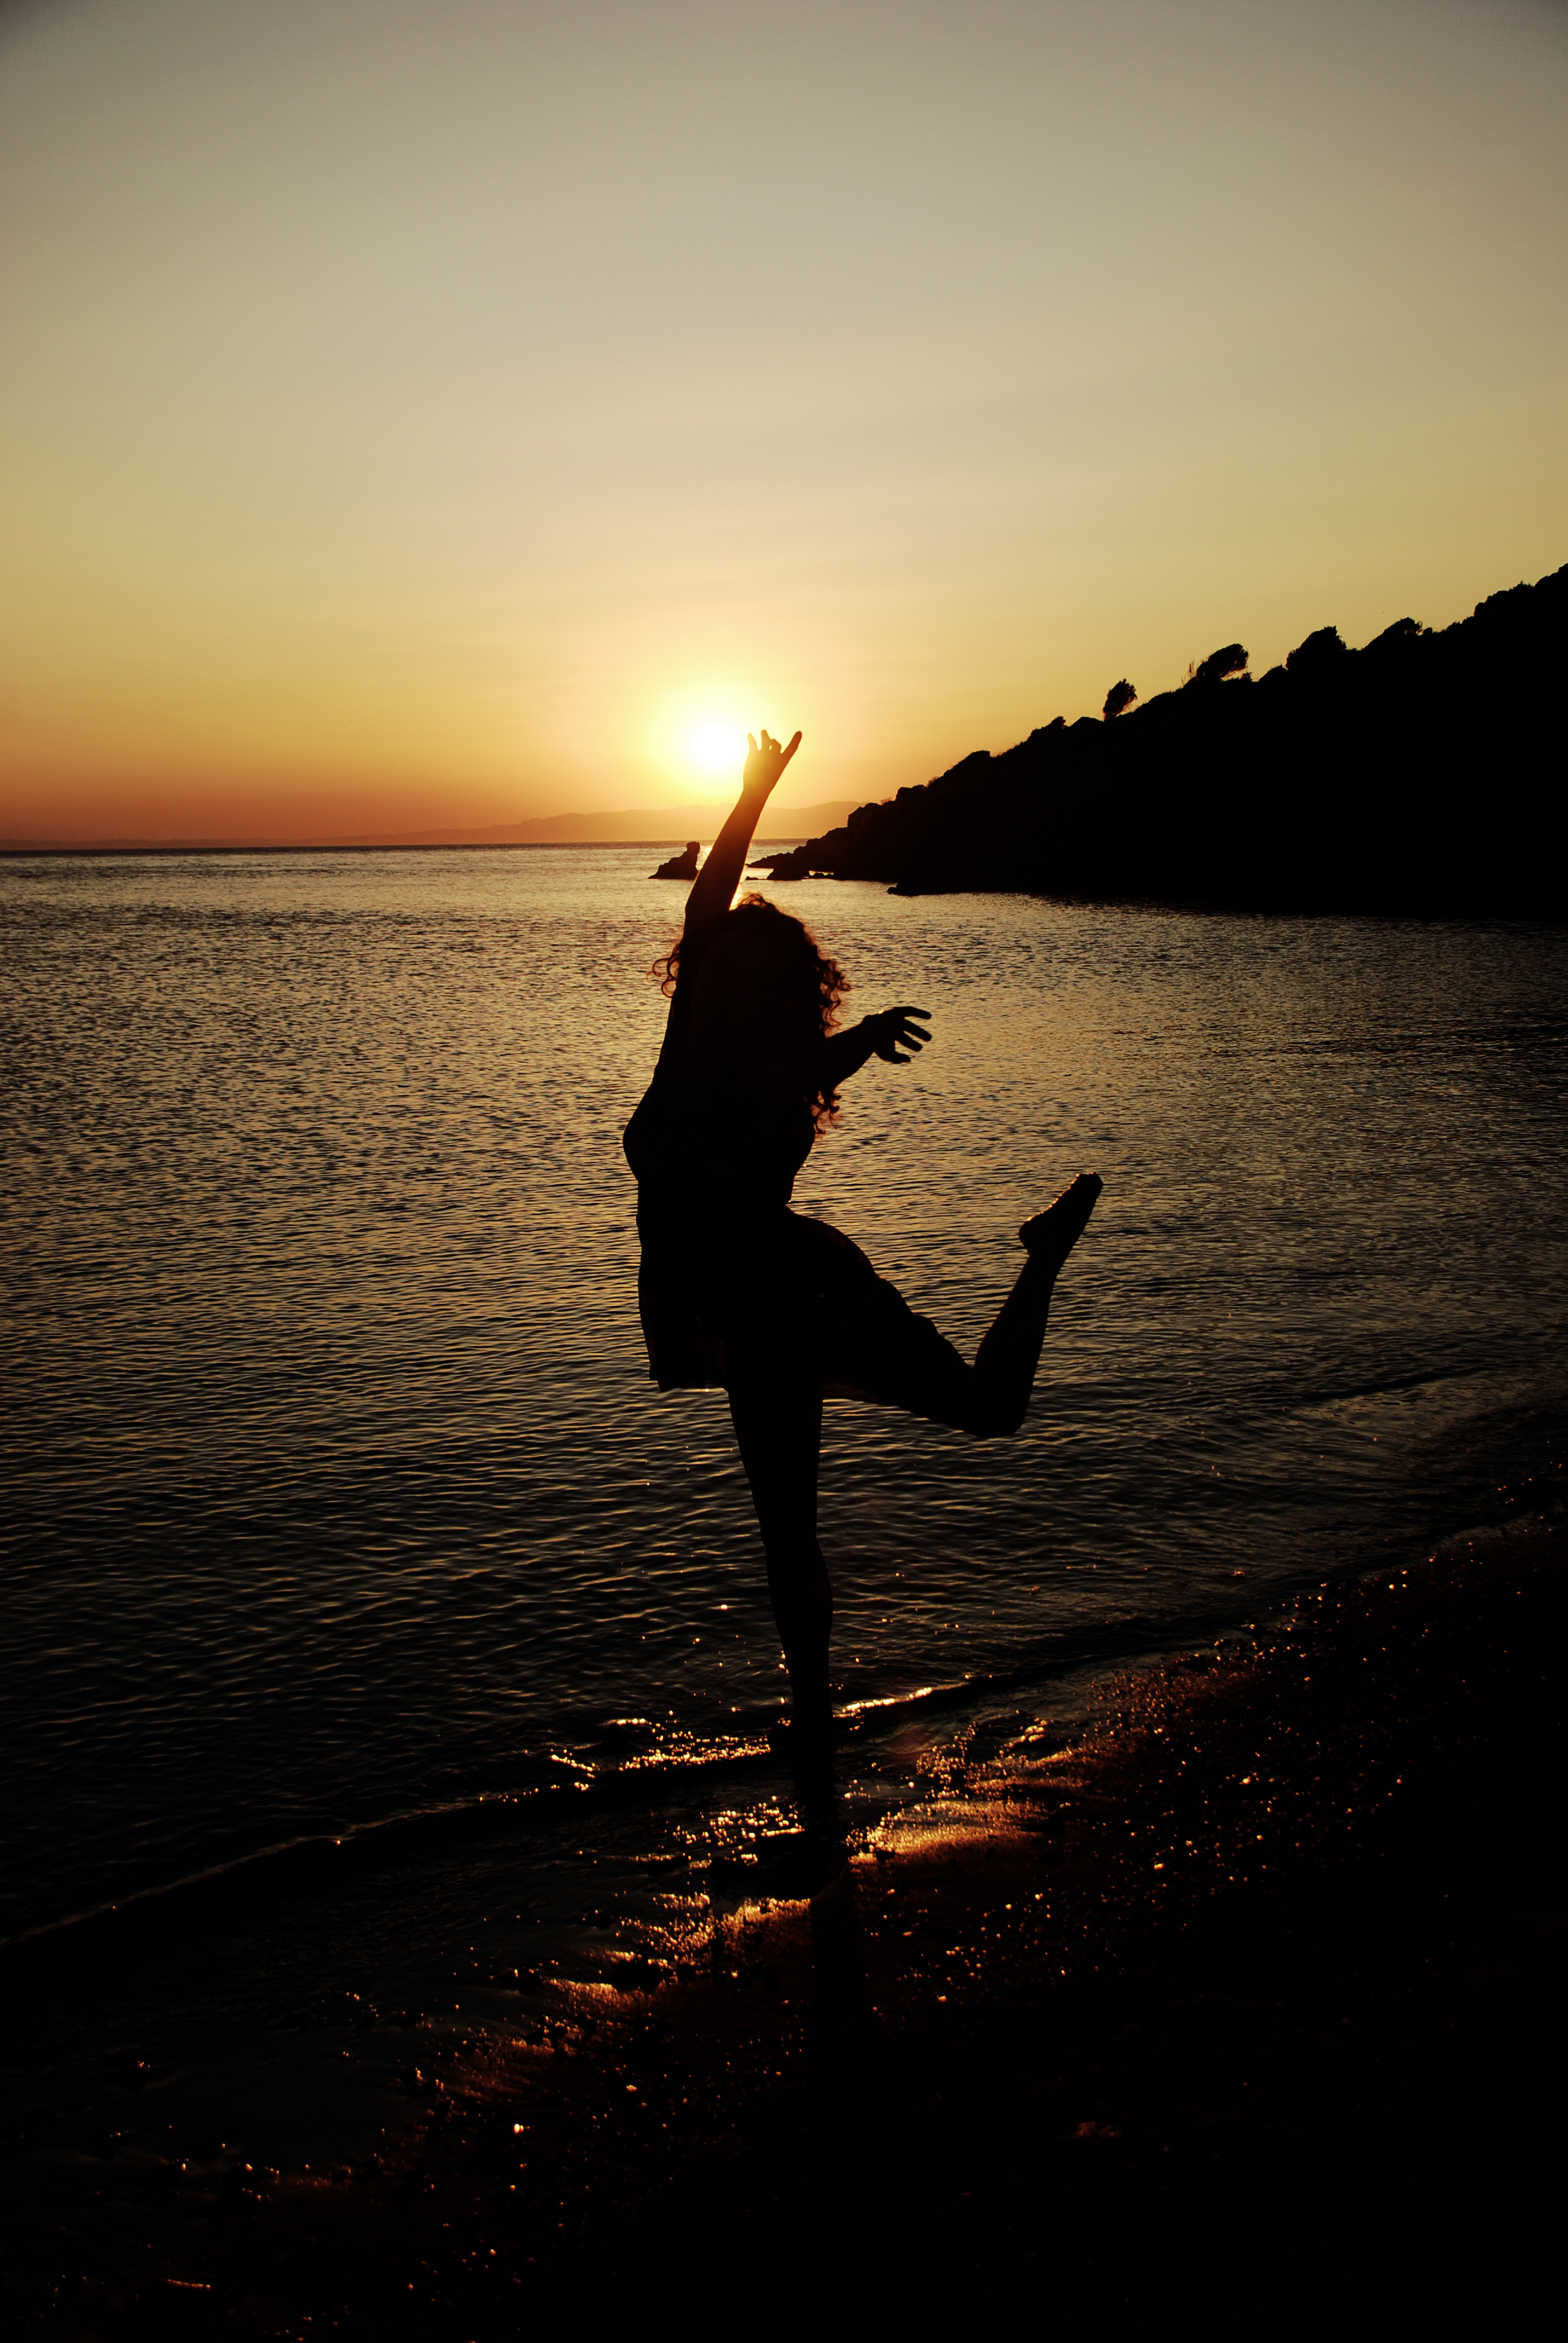 Dance in the sunlight by seainside